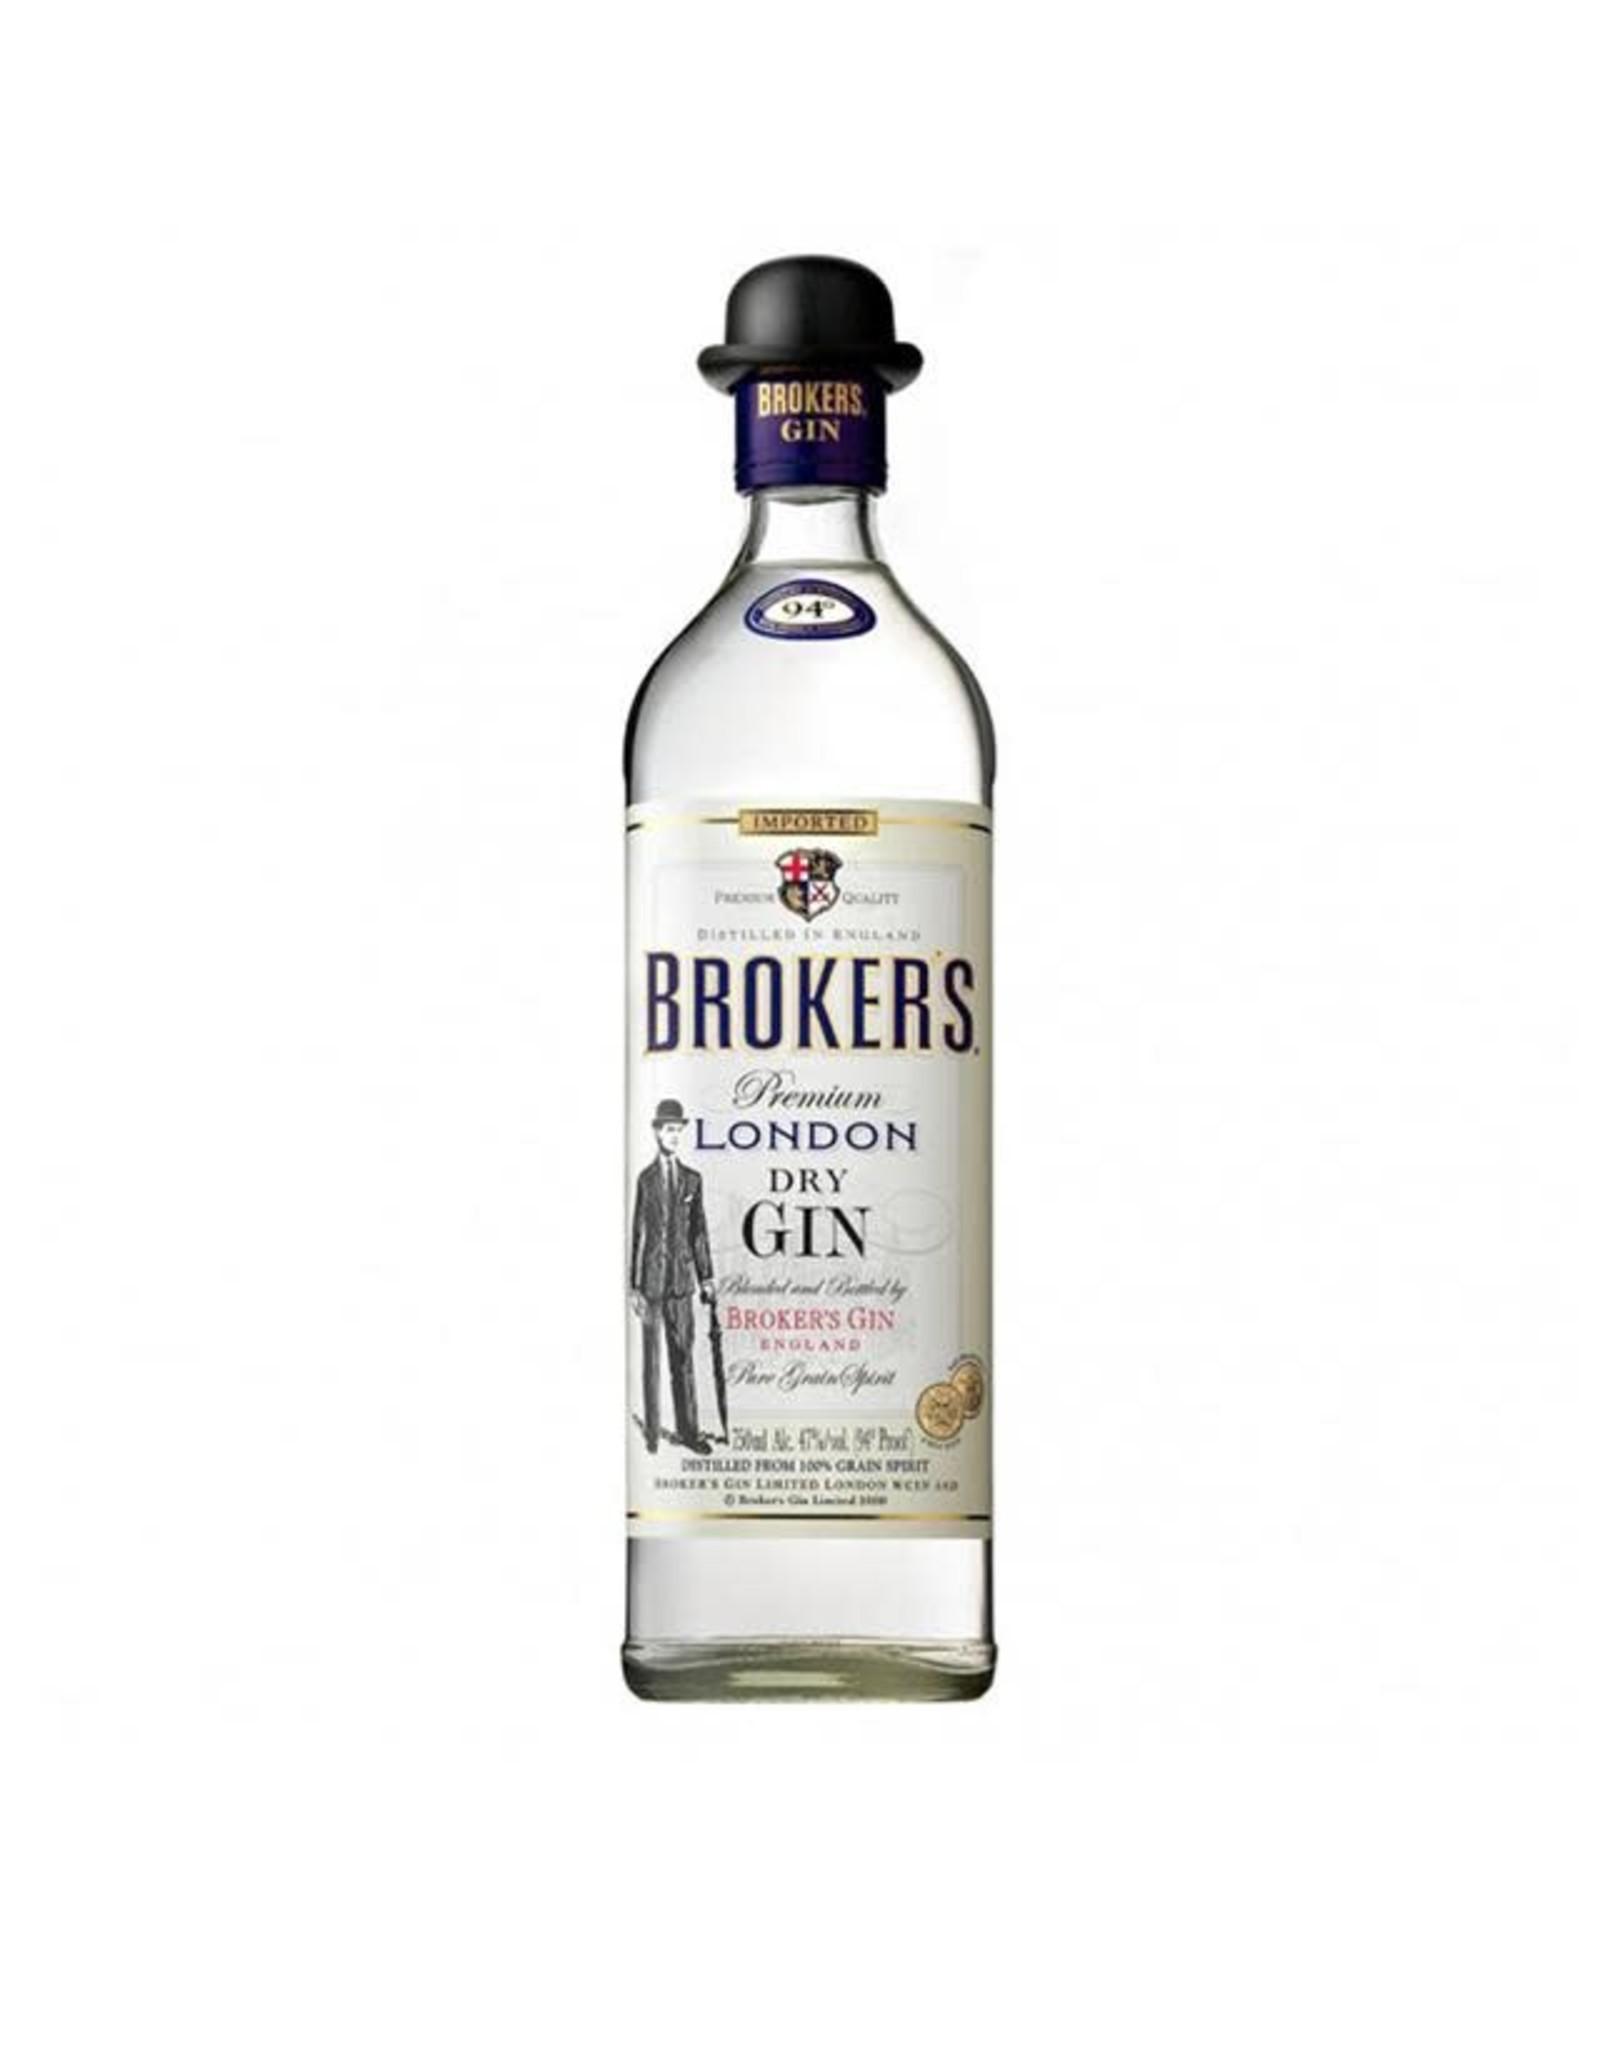 BROKERS GIN 750ML